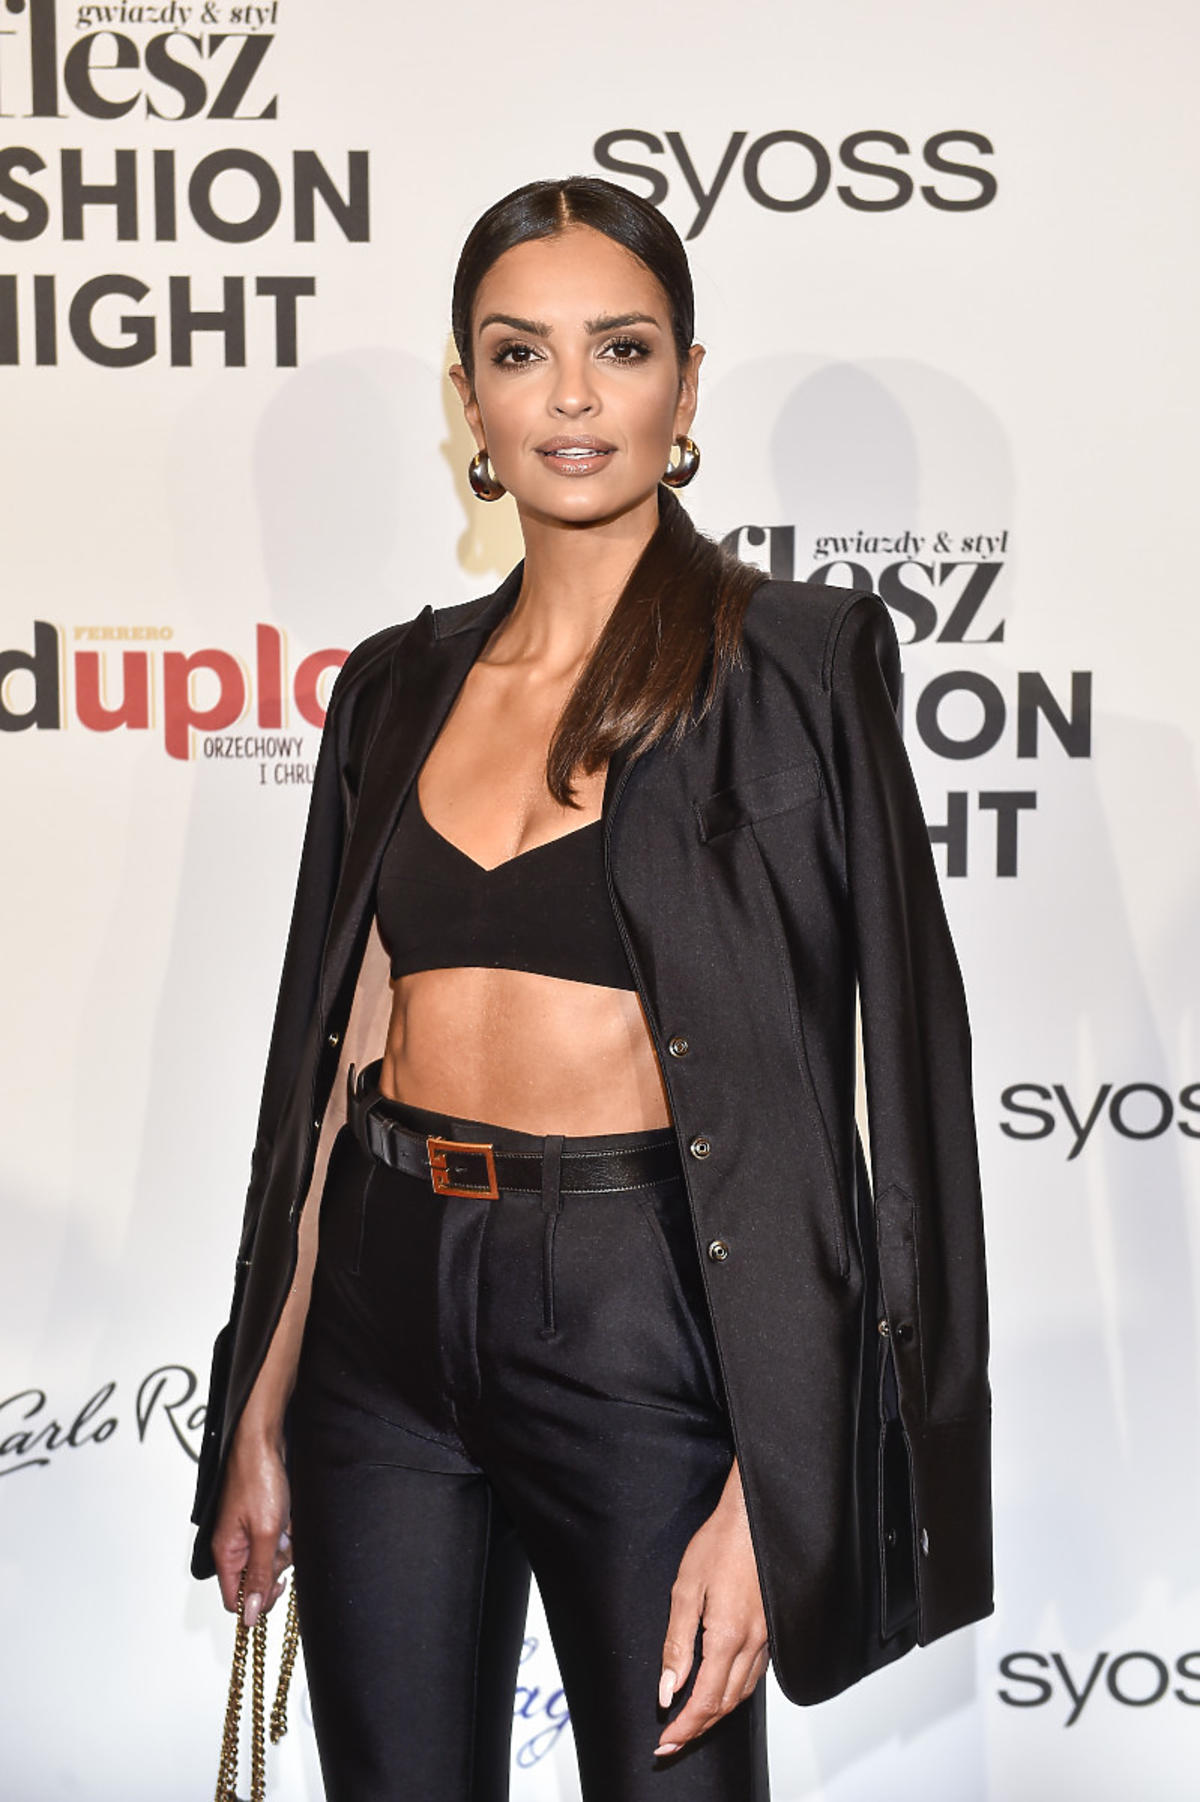 Klaudia El Dursi na Flesz Fashion Night 2021 w krótkim topie